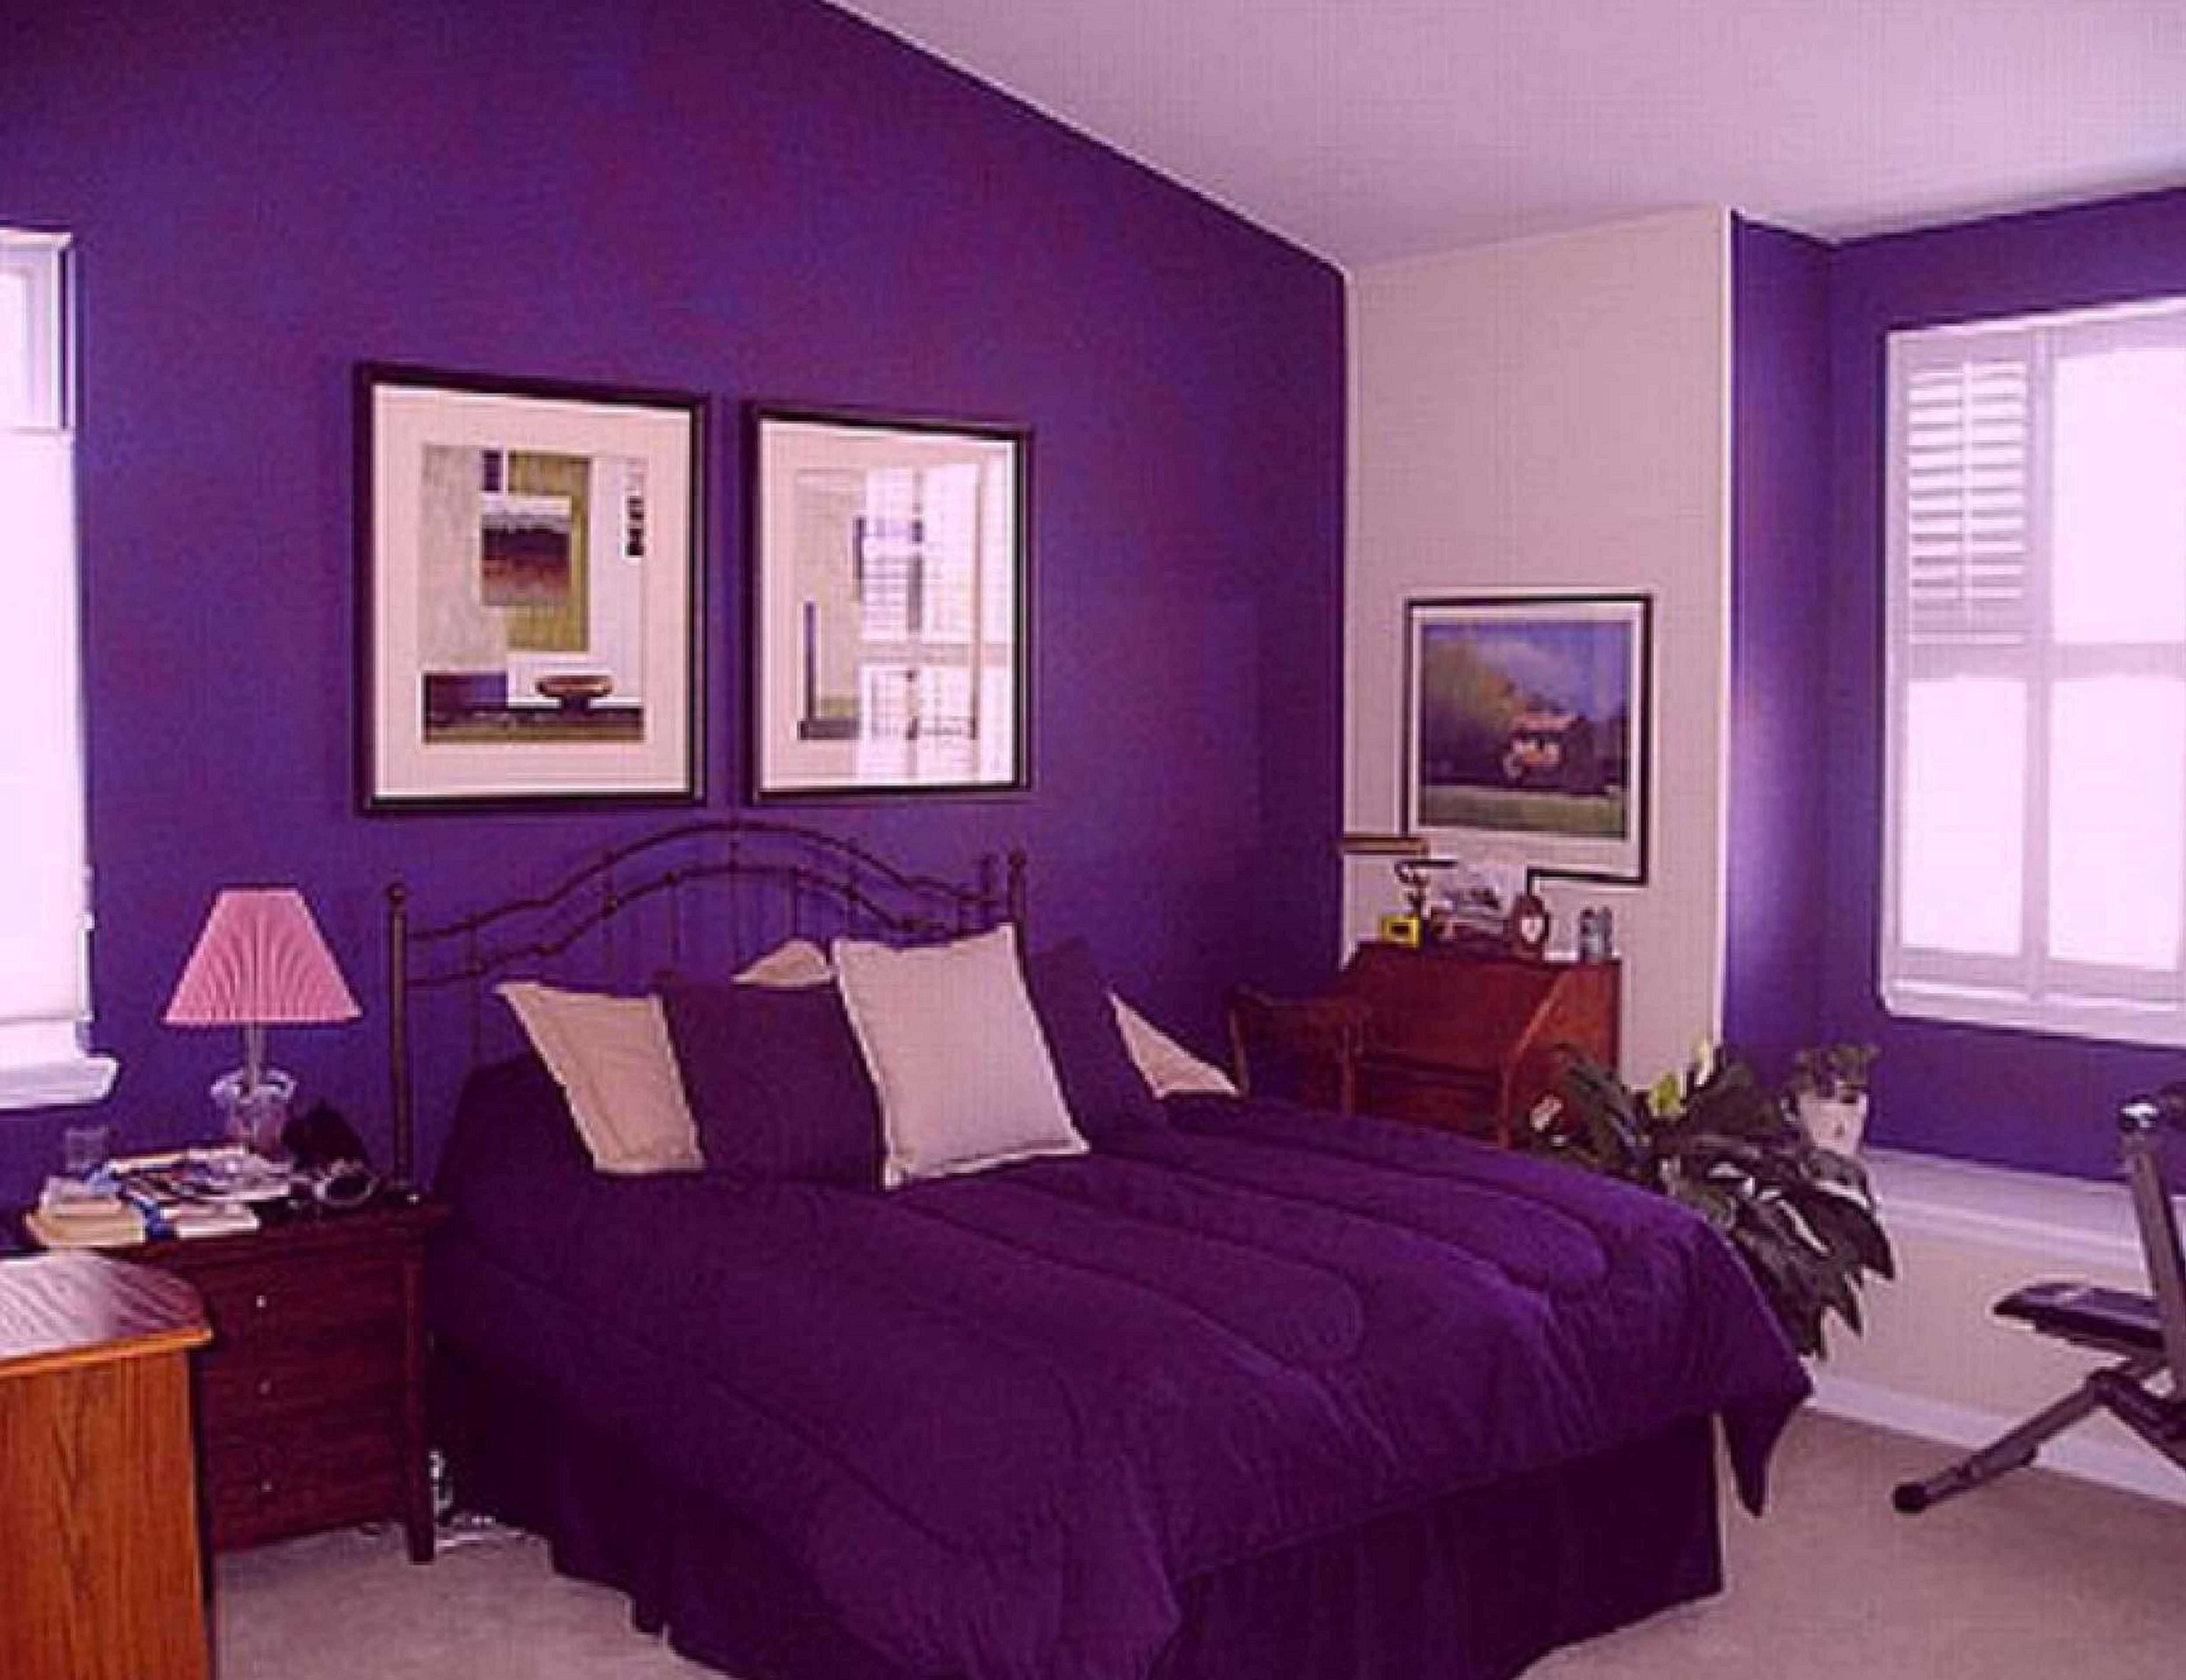 20 Beautiful Bedroom Paint Color Ideas For Cozy Bedding Design Dexorate Purple Bedroom Decor Purple Bedroom Design Purple Bedrooms,1960s Ranch House Exterior Remodel